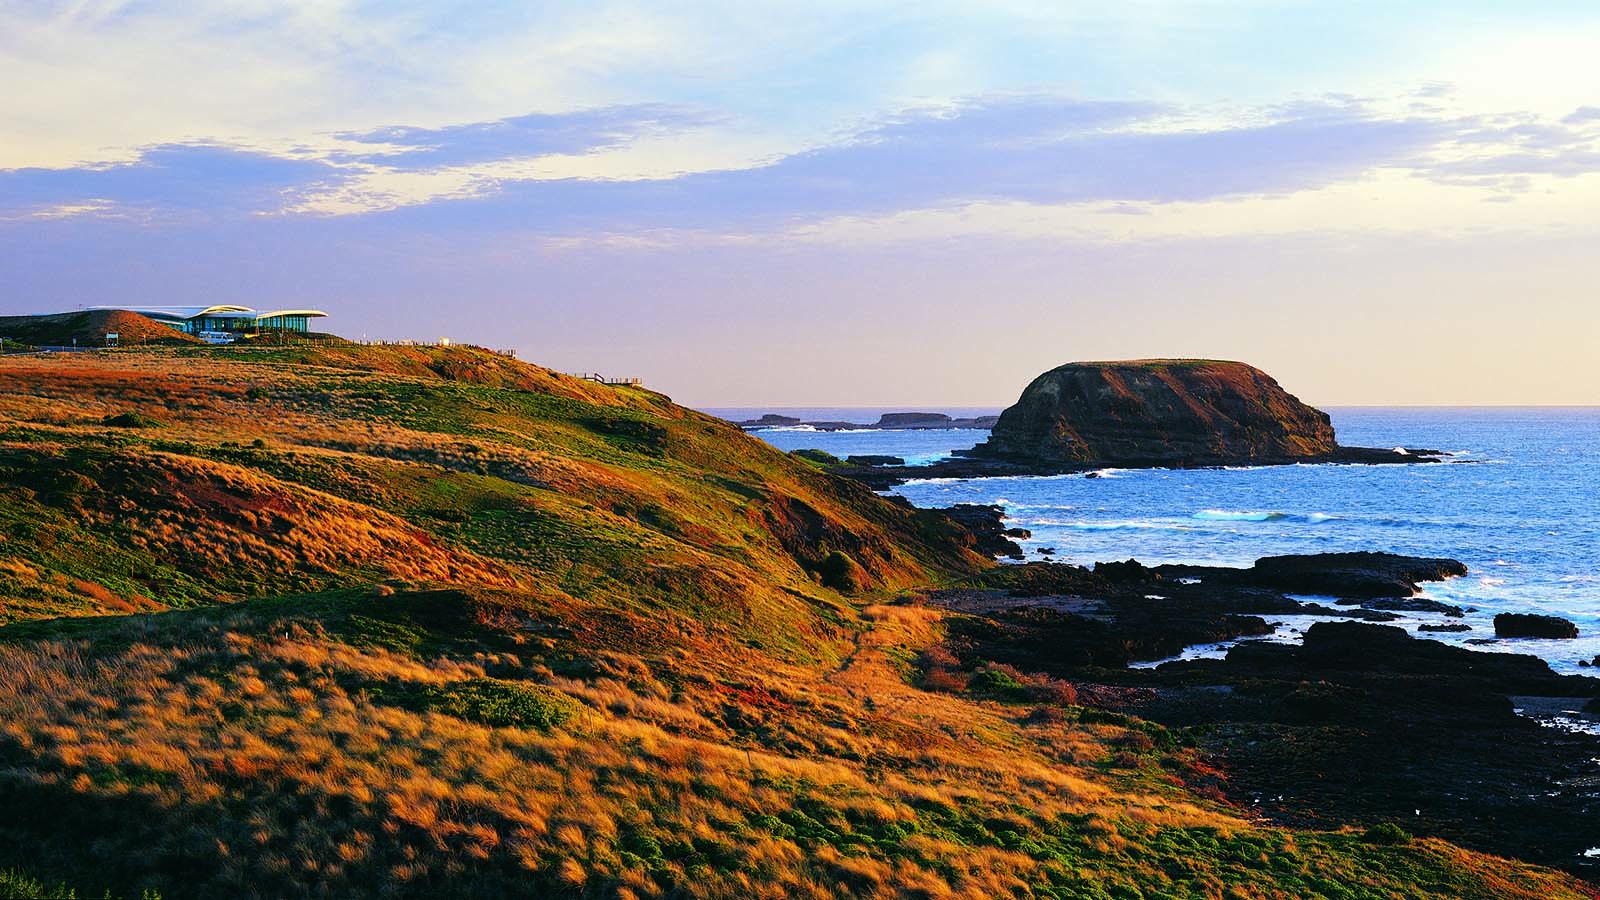 The Nobbies, Phillip Island, Victoria, Australia